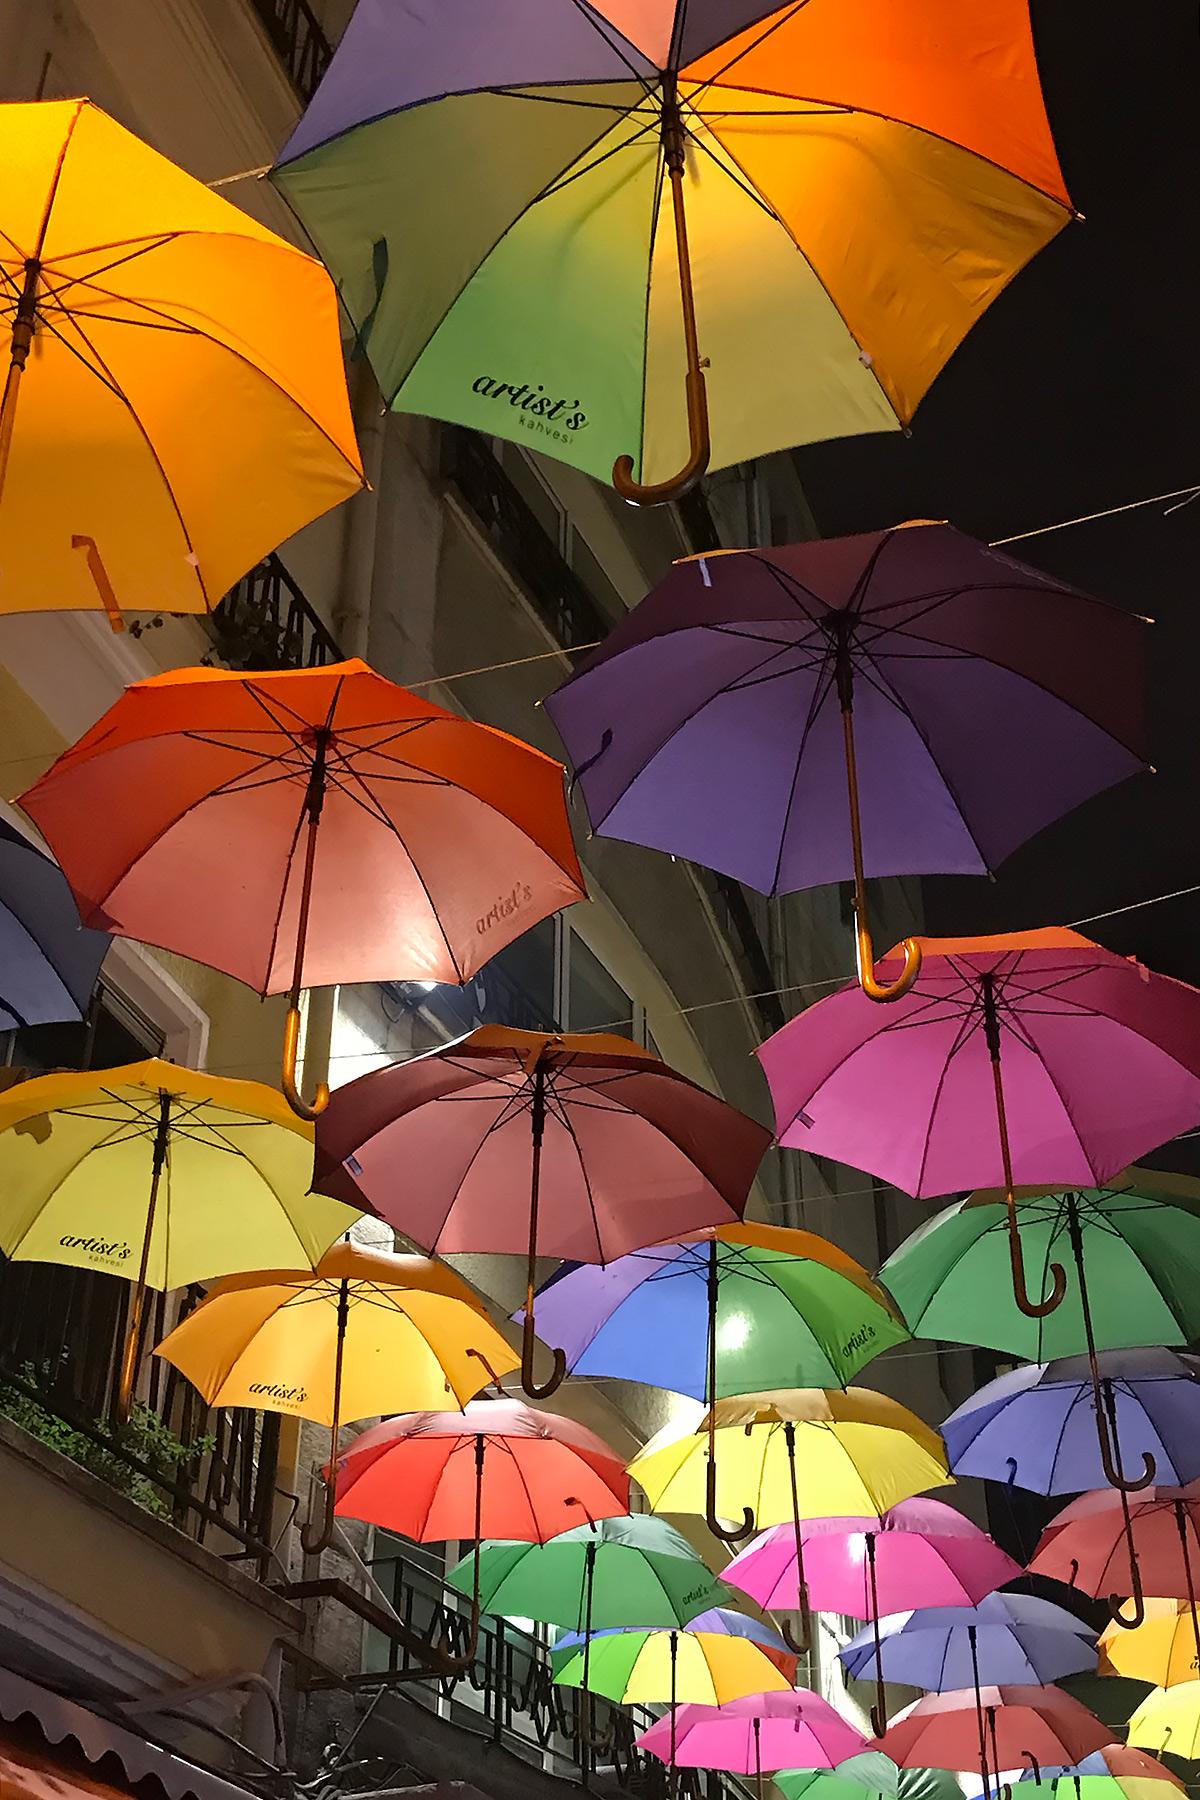 Istanbul-night-life-meyhana-002.jpg